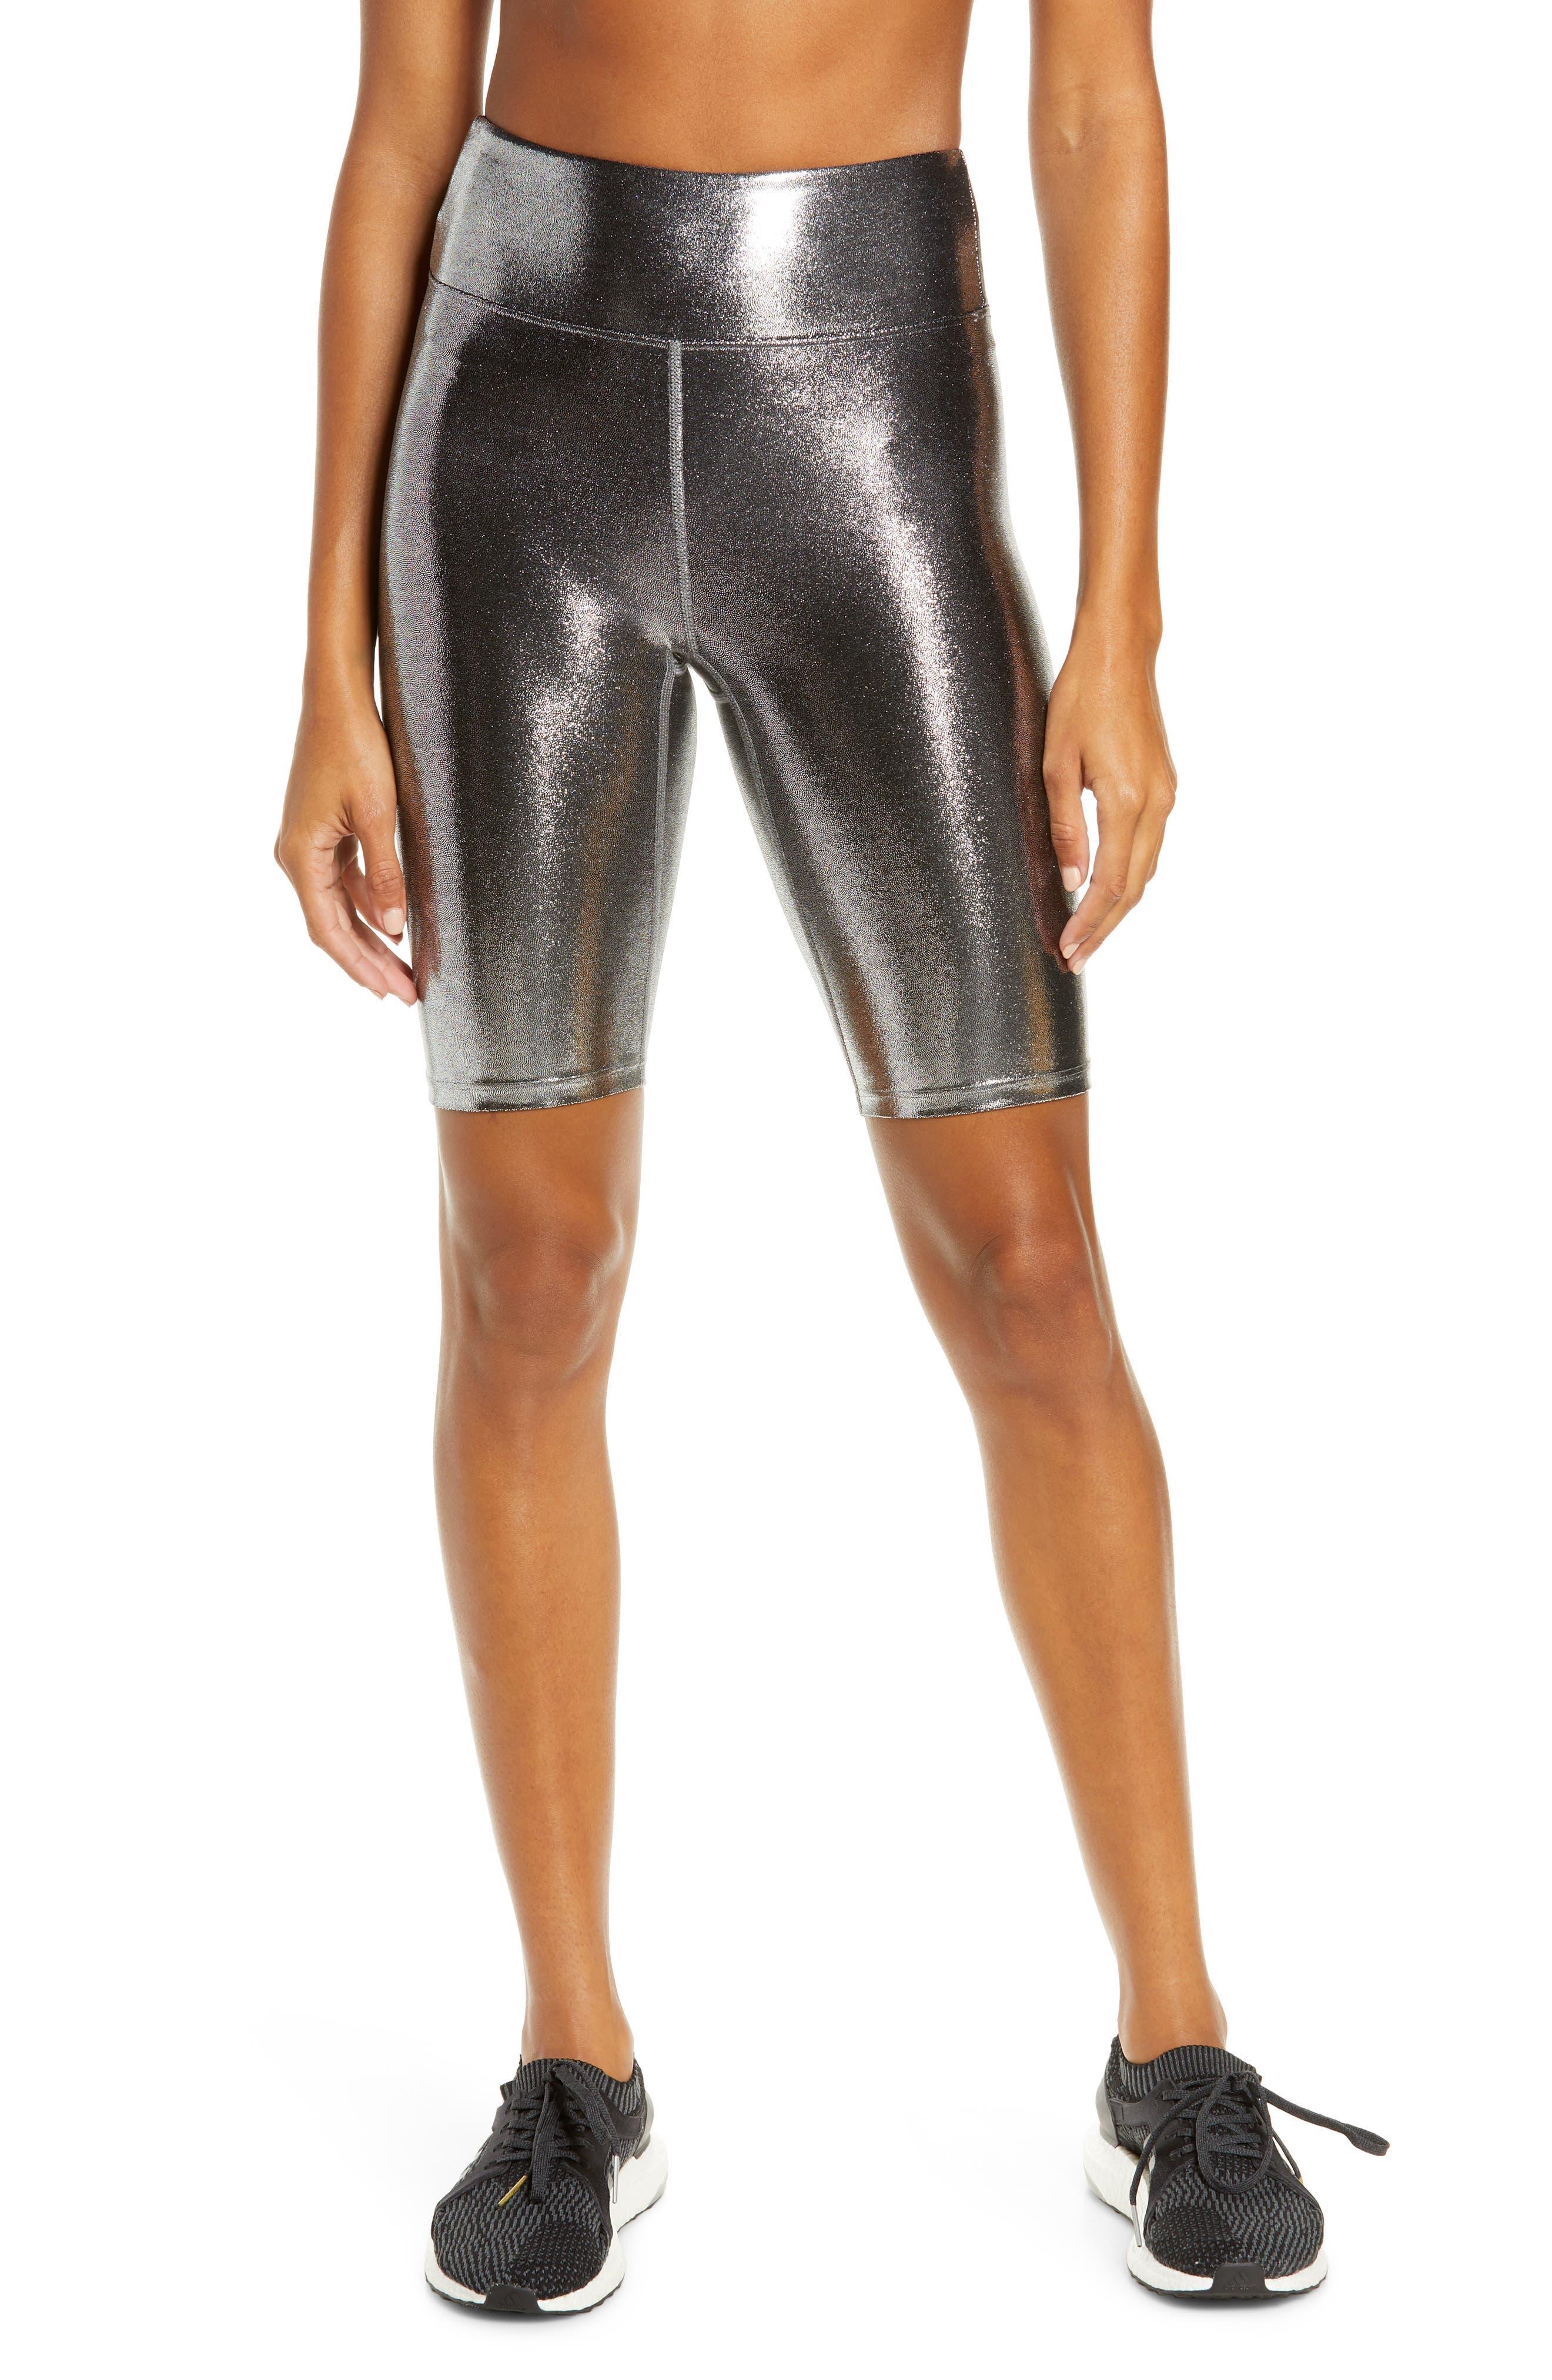 Heroine Sport Women's Heroine Sport Marvel Bike Shorts, Size X-Small - Grey